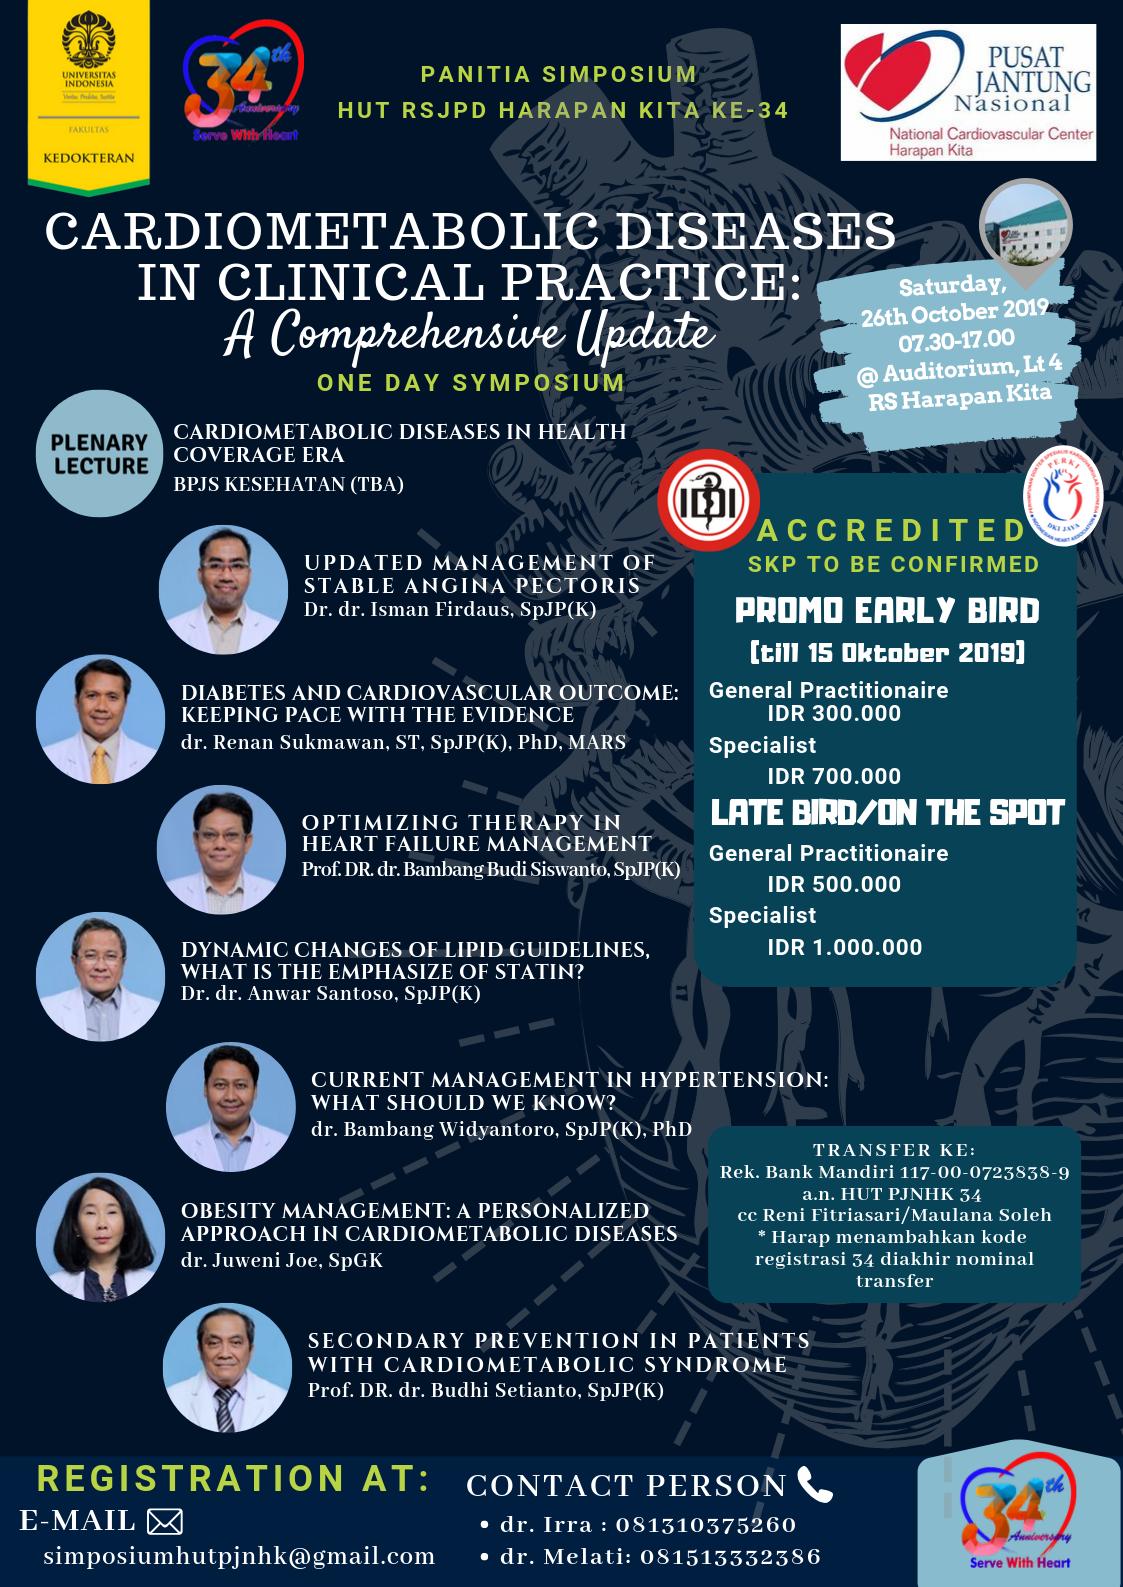 "Simposium HUT RSJPD Harapan Kita ke-34 ""Cardiometabolic Diseases: In Clinical Practice: A Comprehensive Update"""